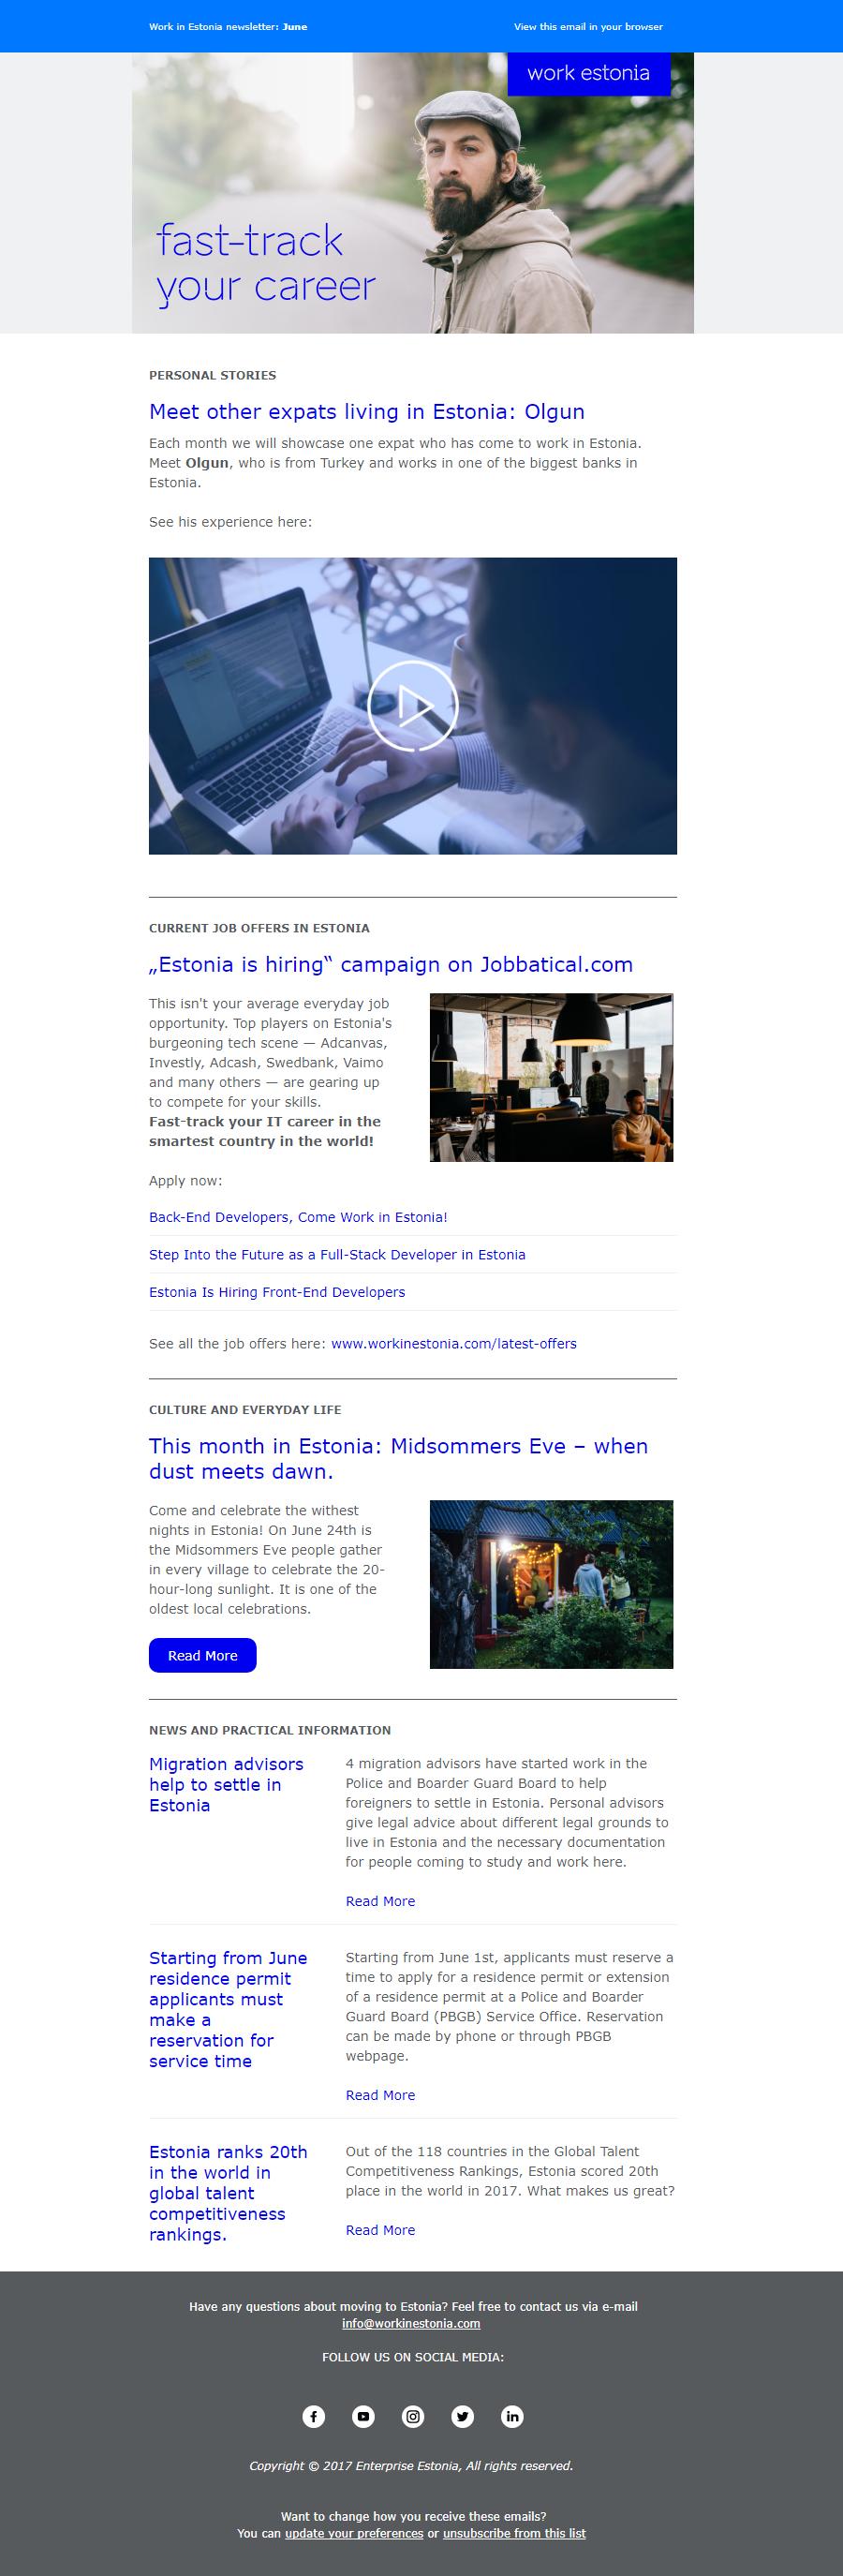 Work estonia newsletter design